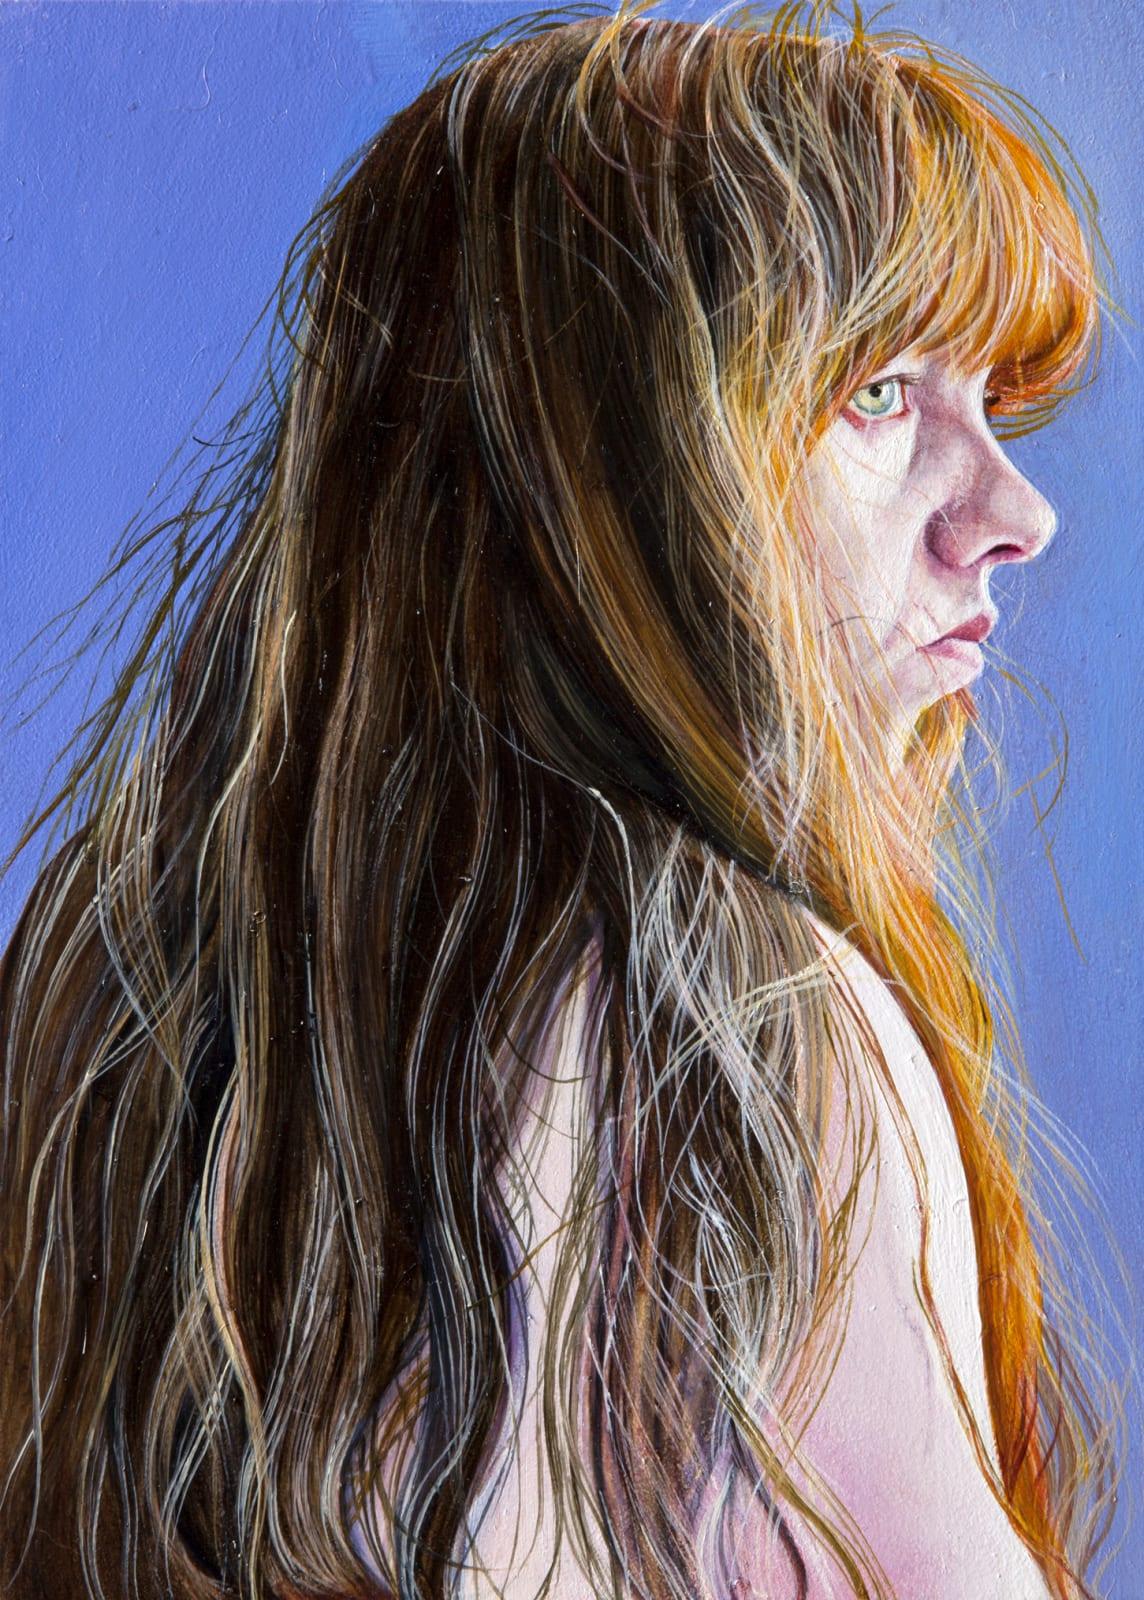 Ishbel Myerscough, Self portrait, 2015